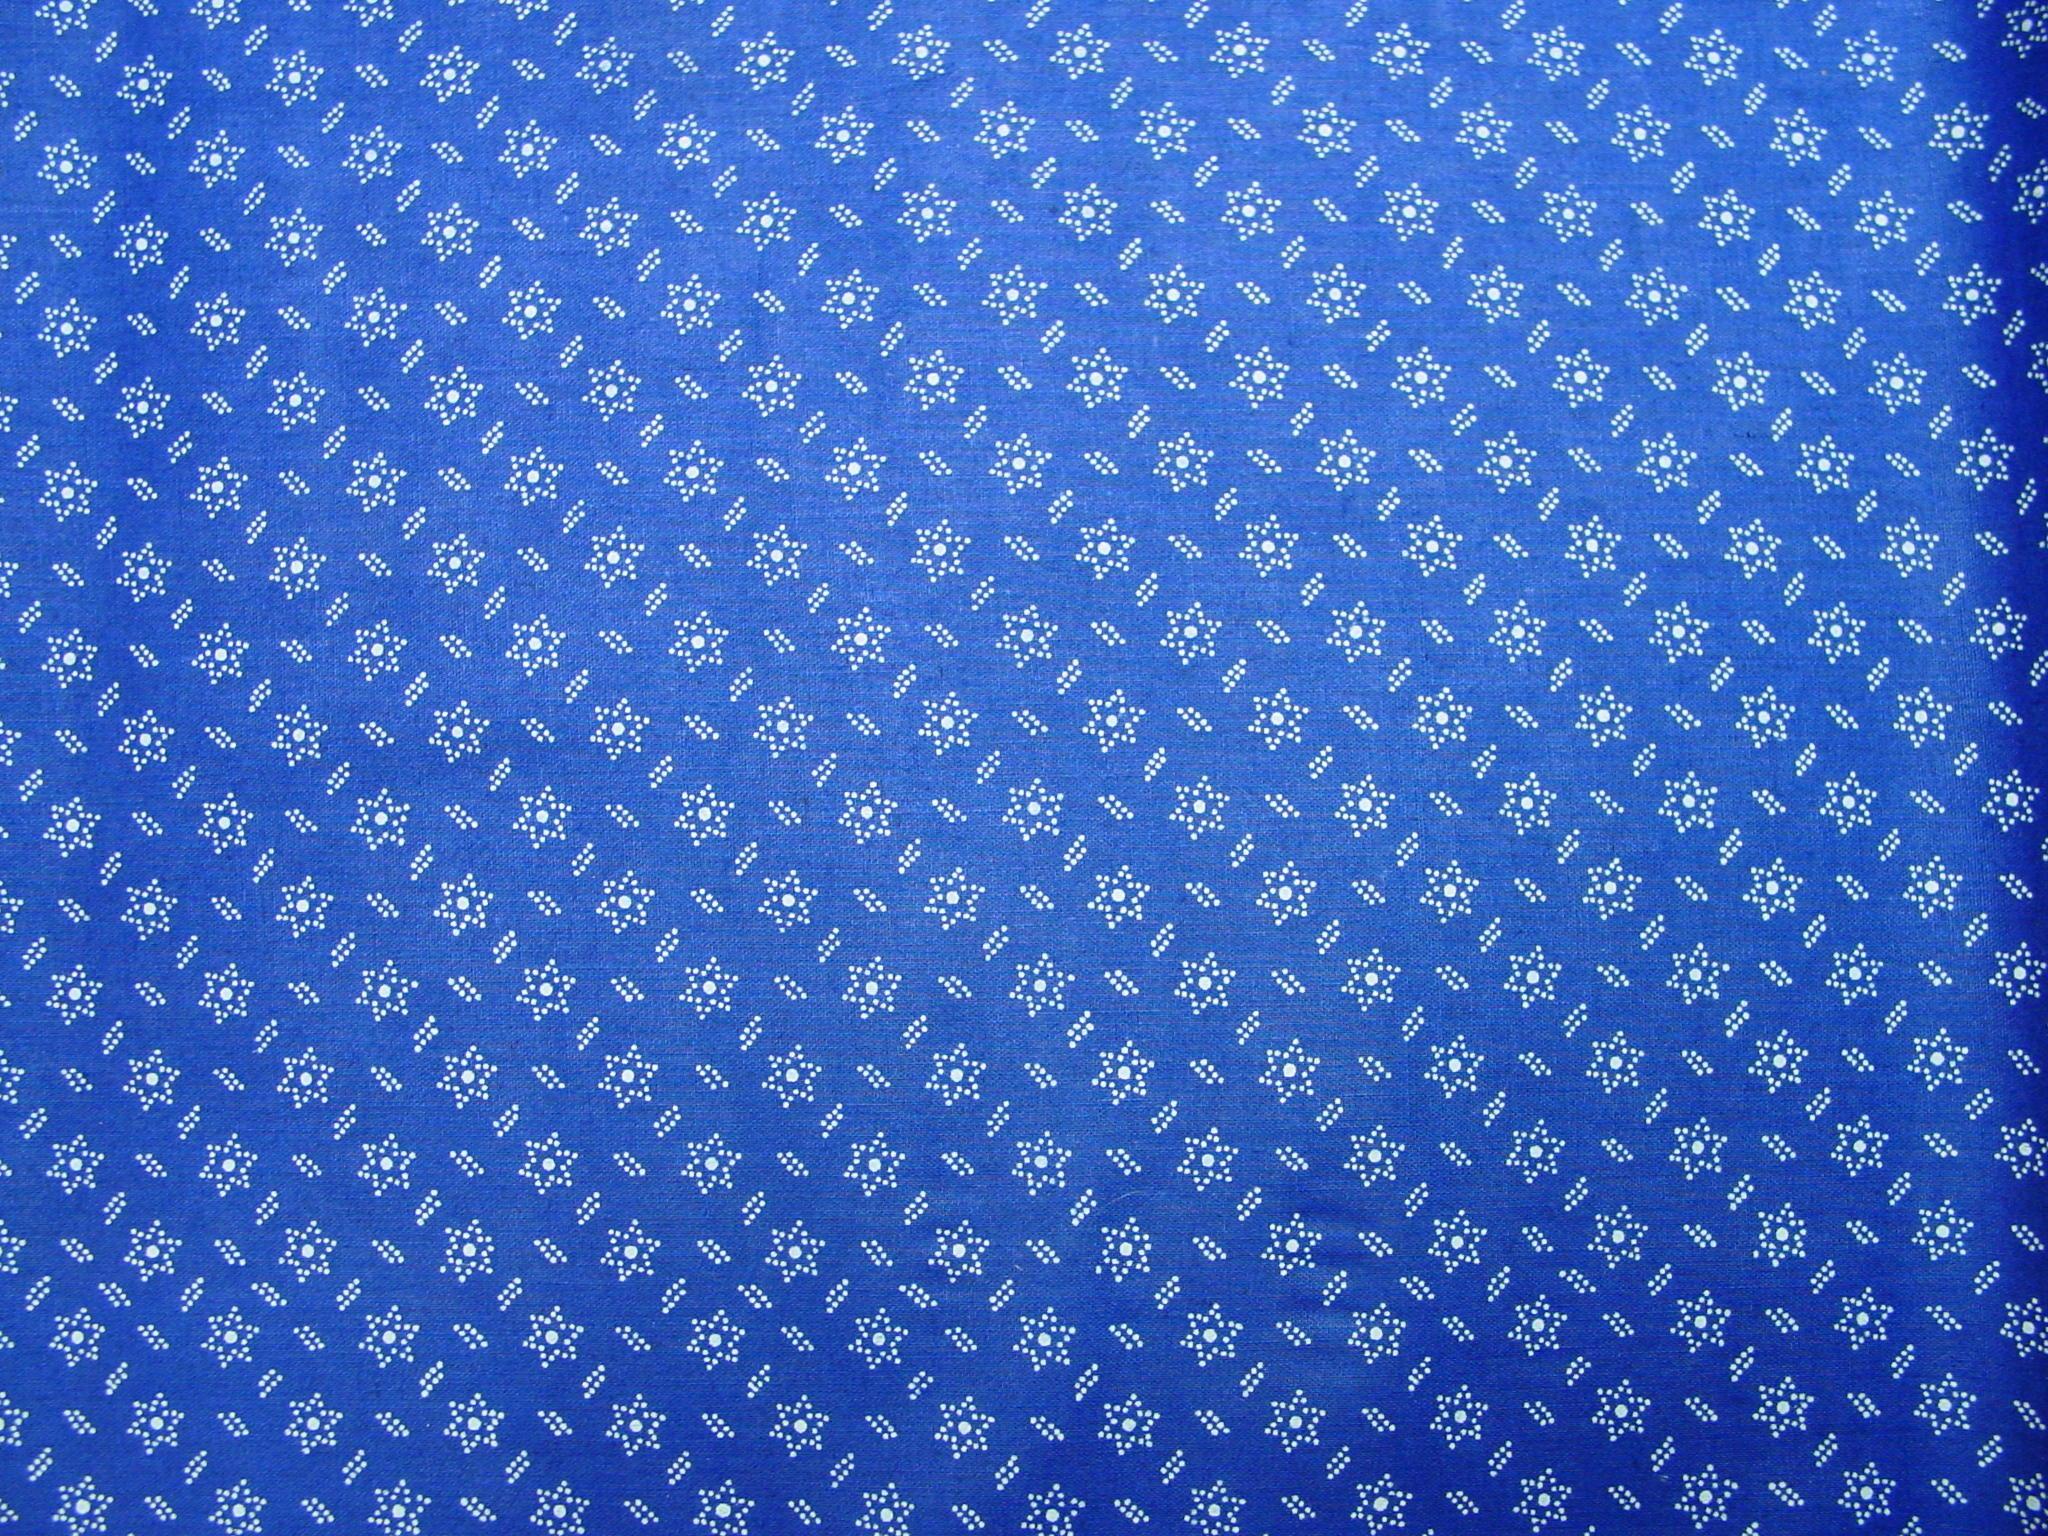 Blaudruckstoff 227-0